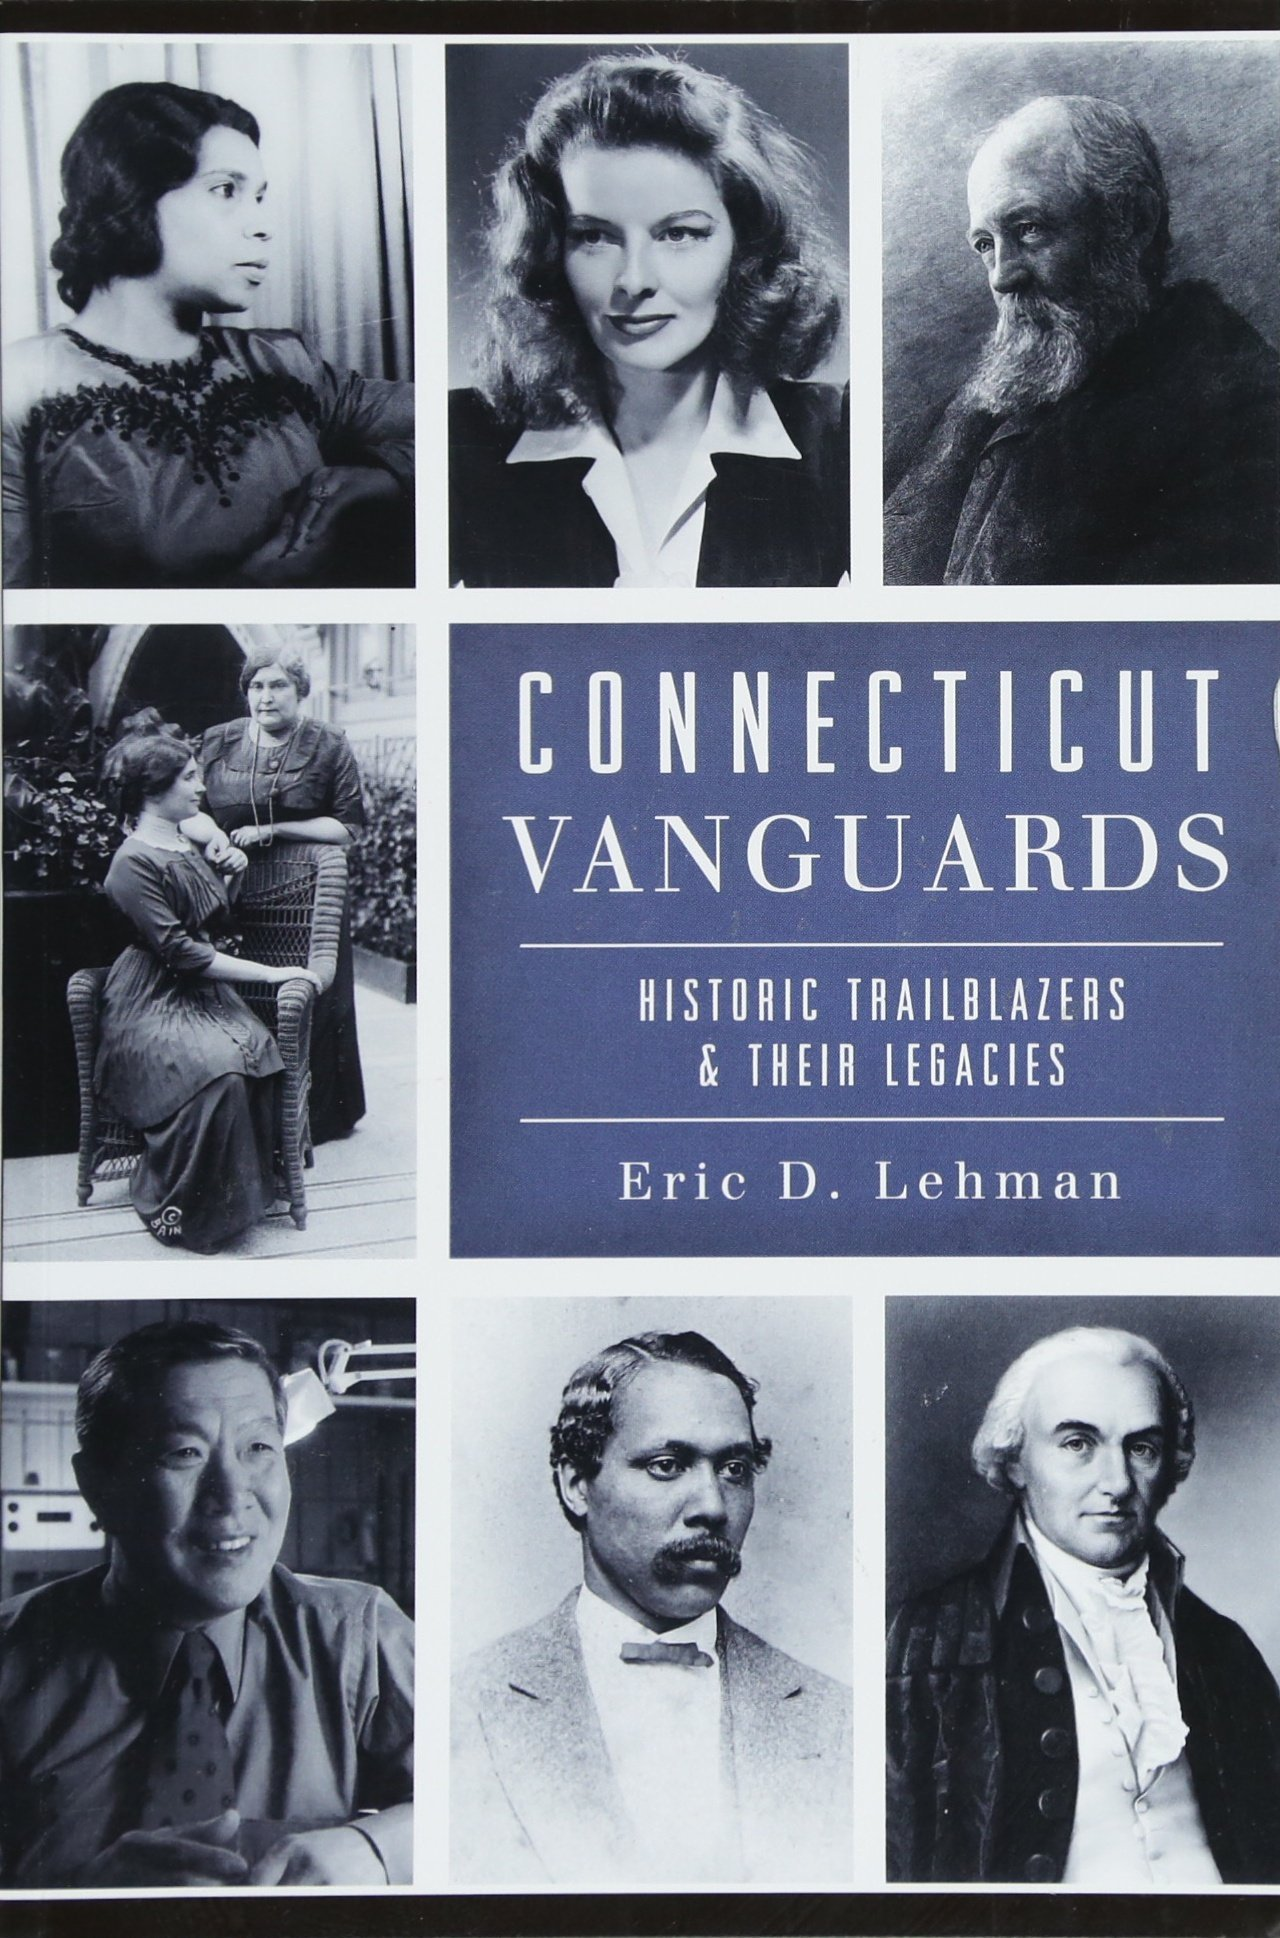 Connecticut Vanguards: Historic Trailblazers & Their Legacies ebook